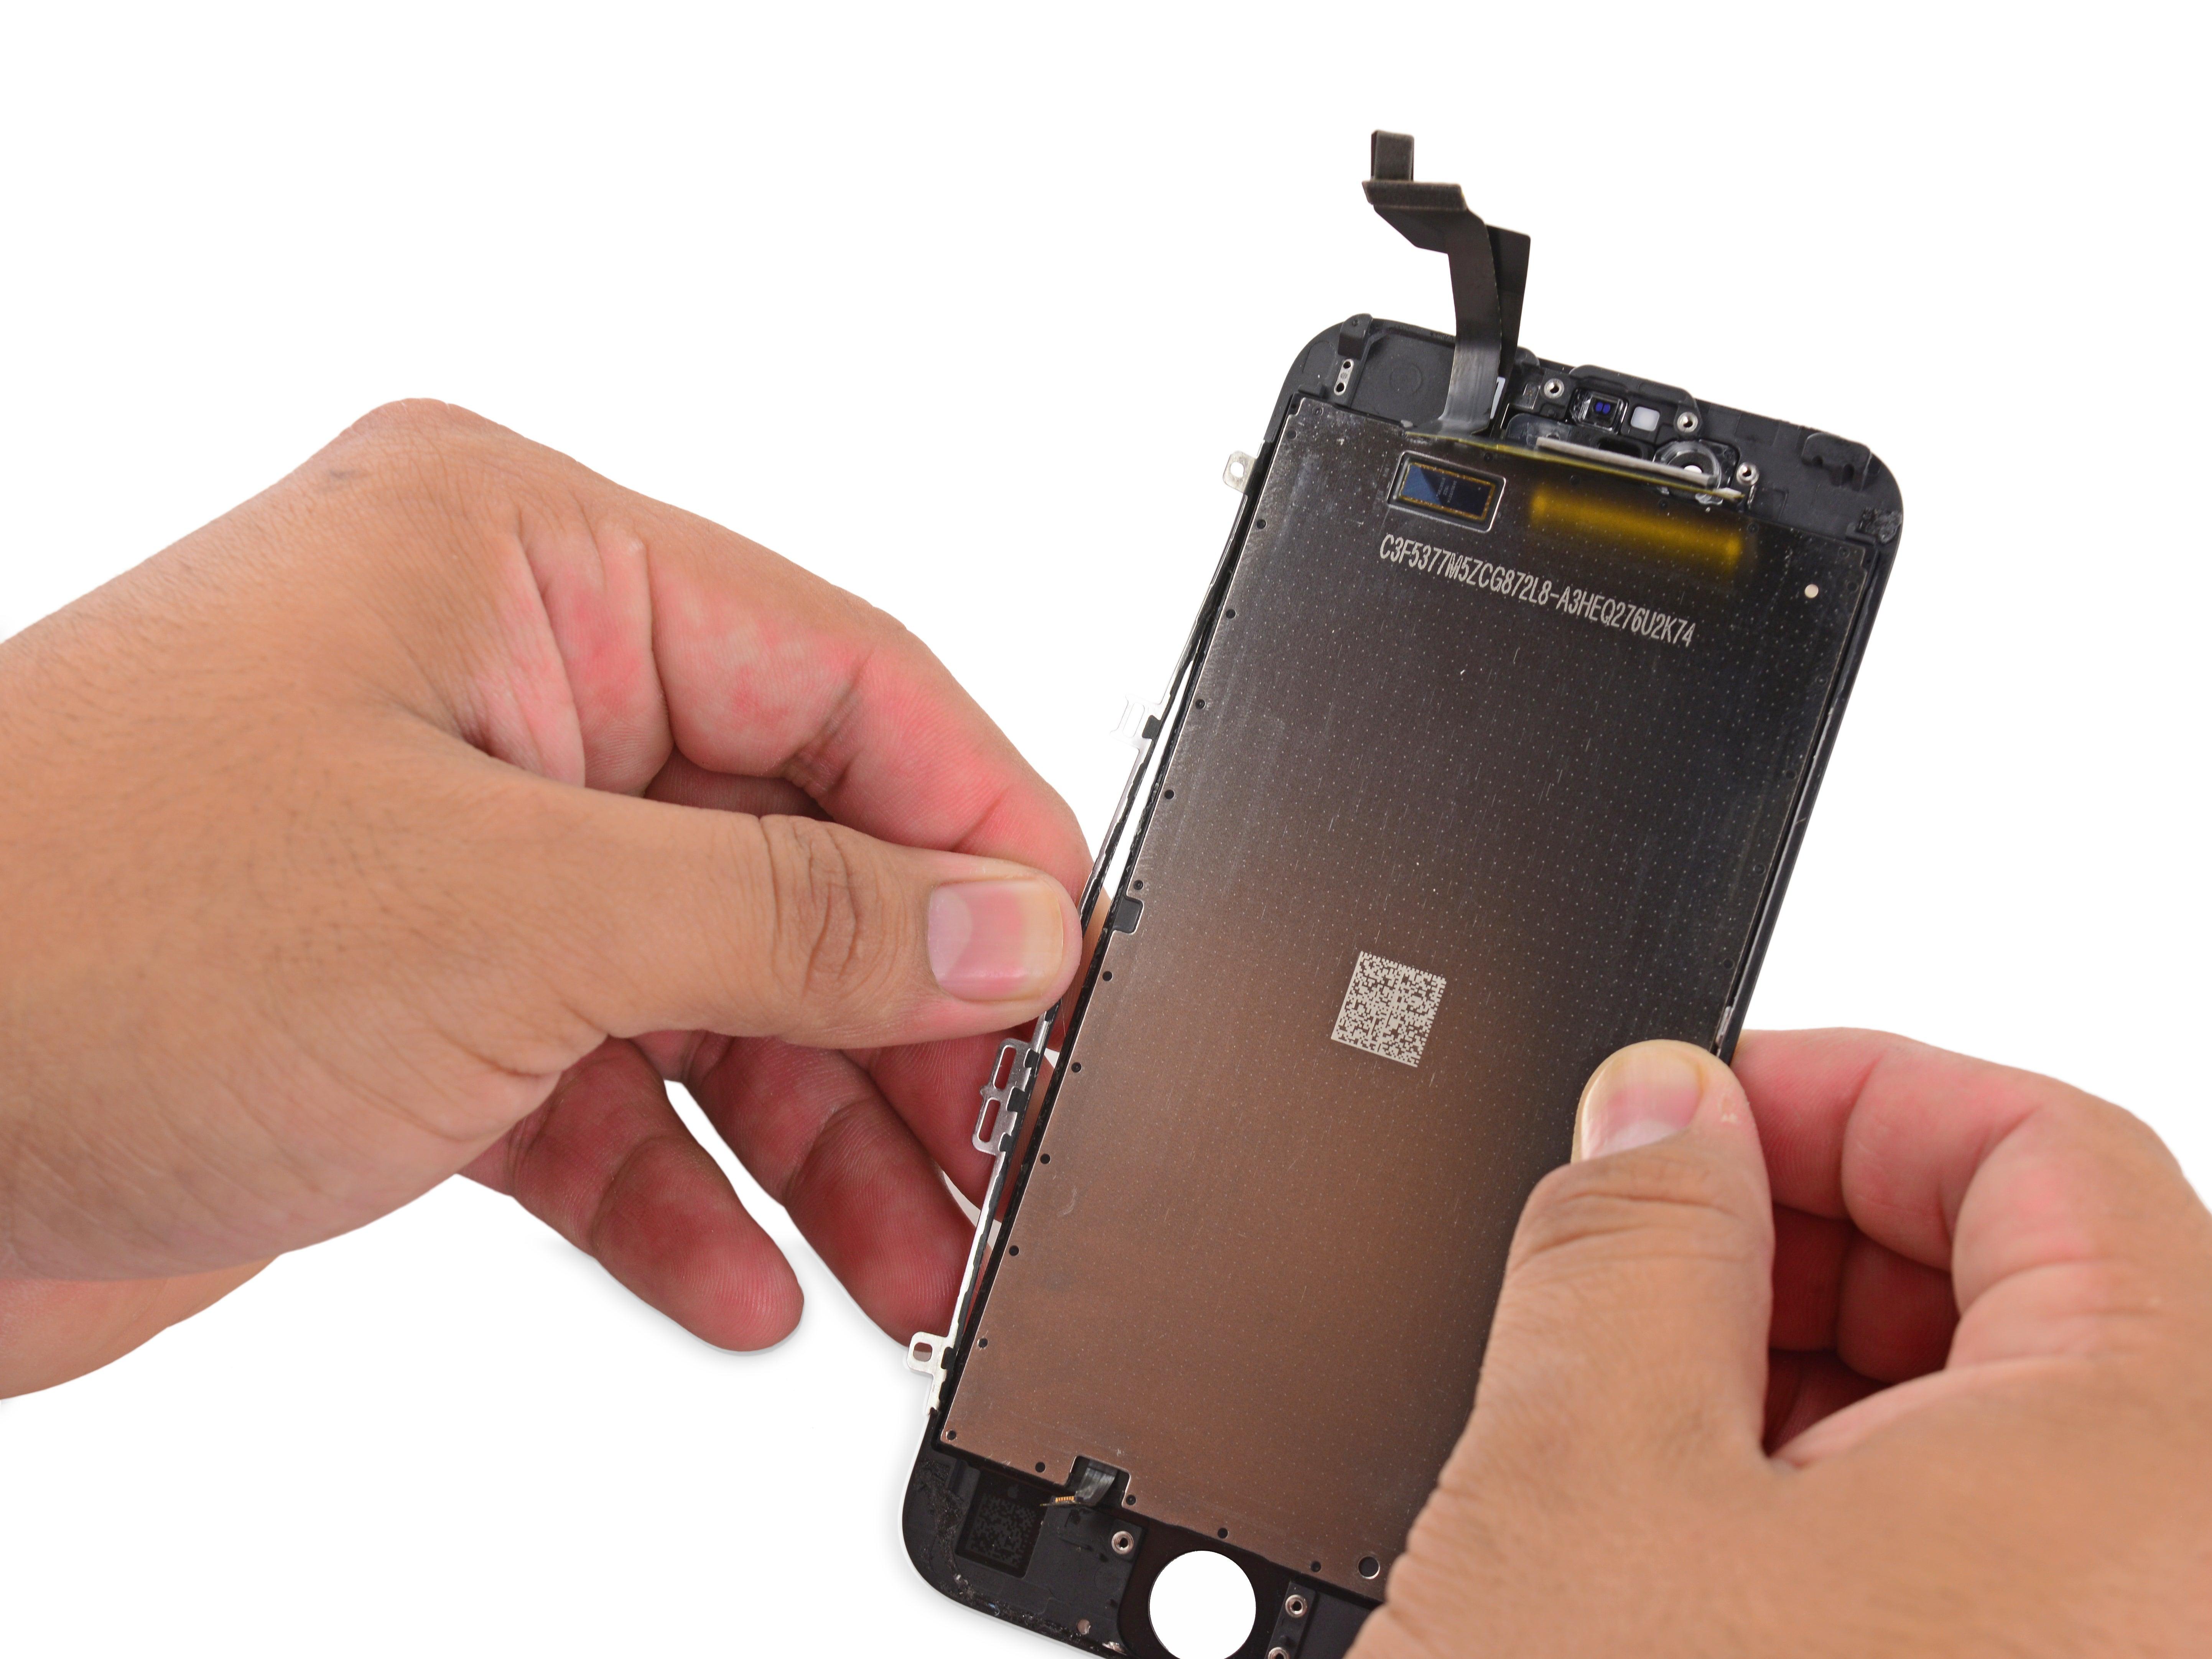 Iphone 6s Display Teardown Reveals How 3d Touch Sensors Actually 3 Circuit Diagram Work Macworld